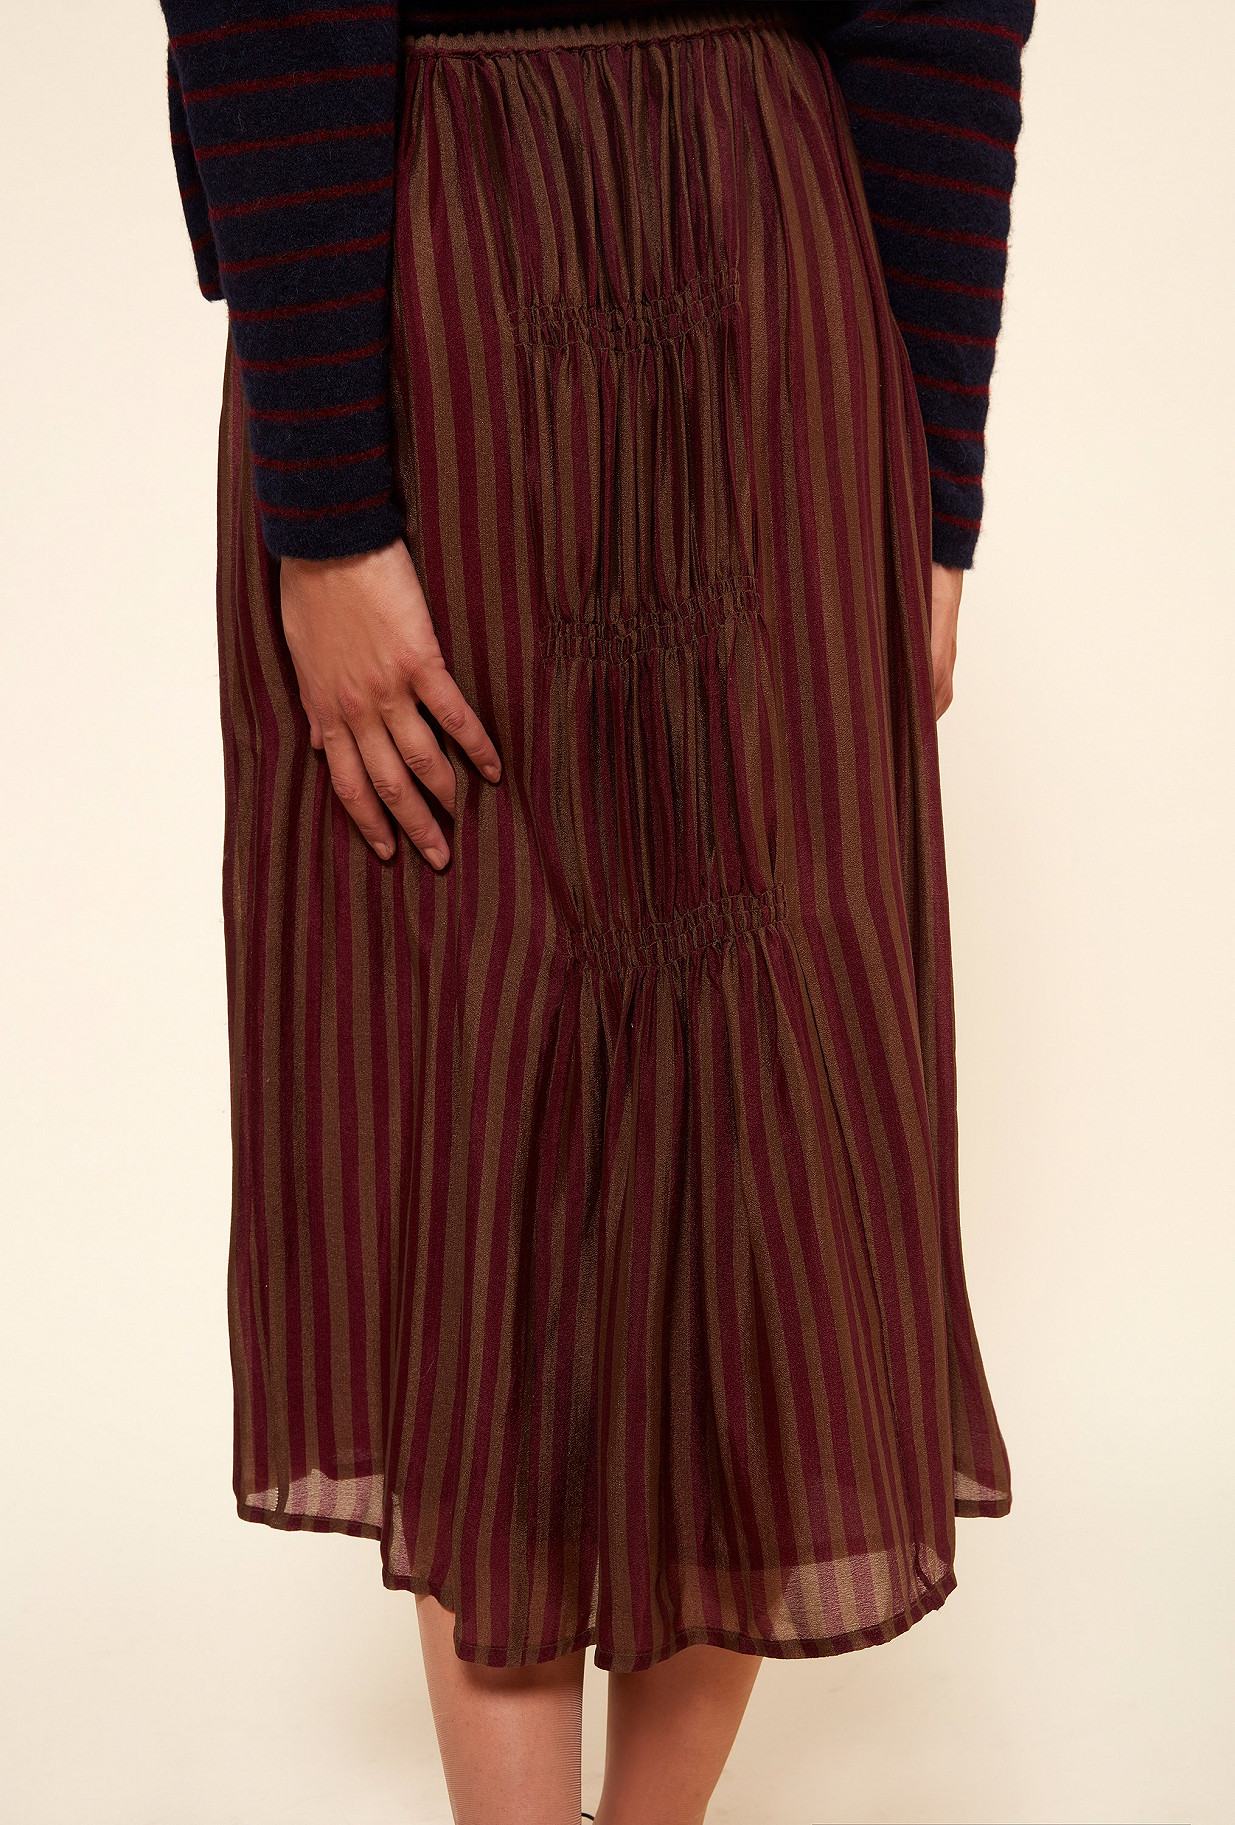 Red Skirt Chaton